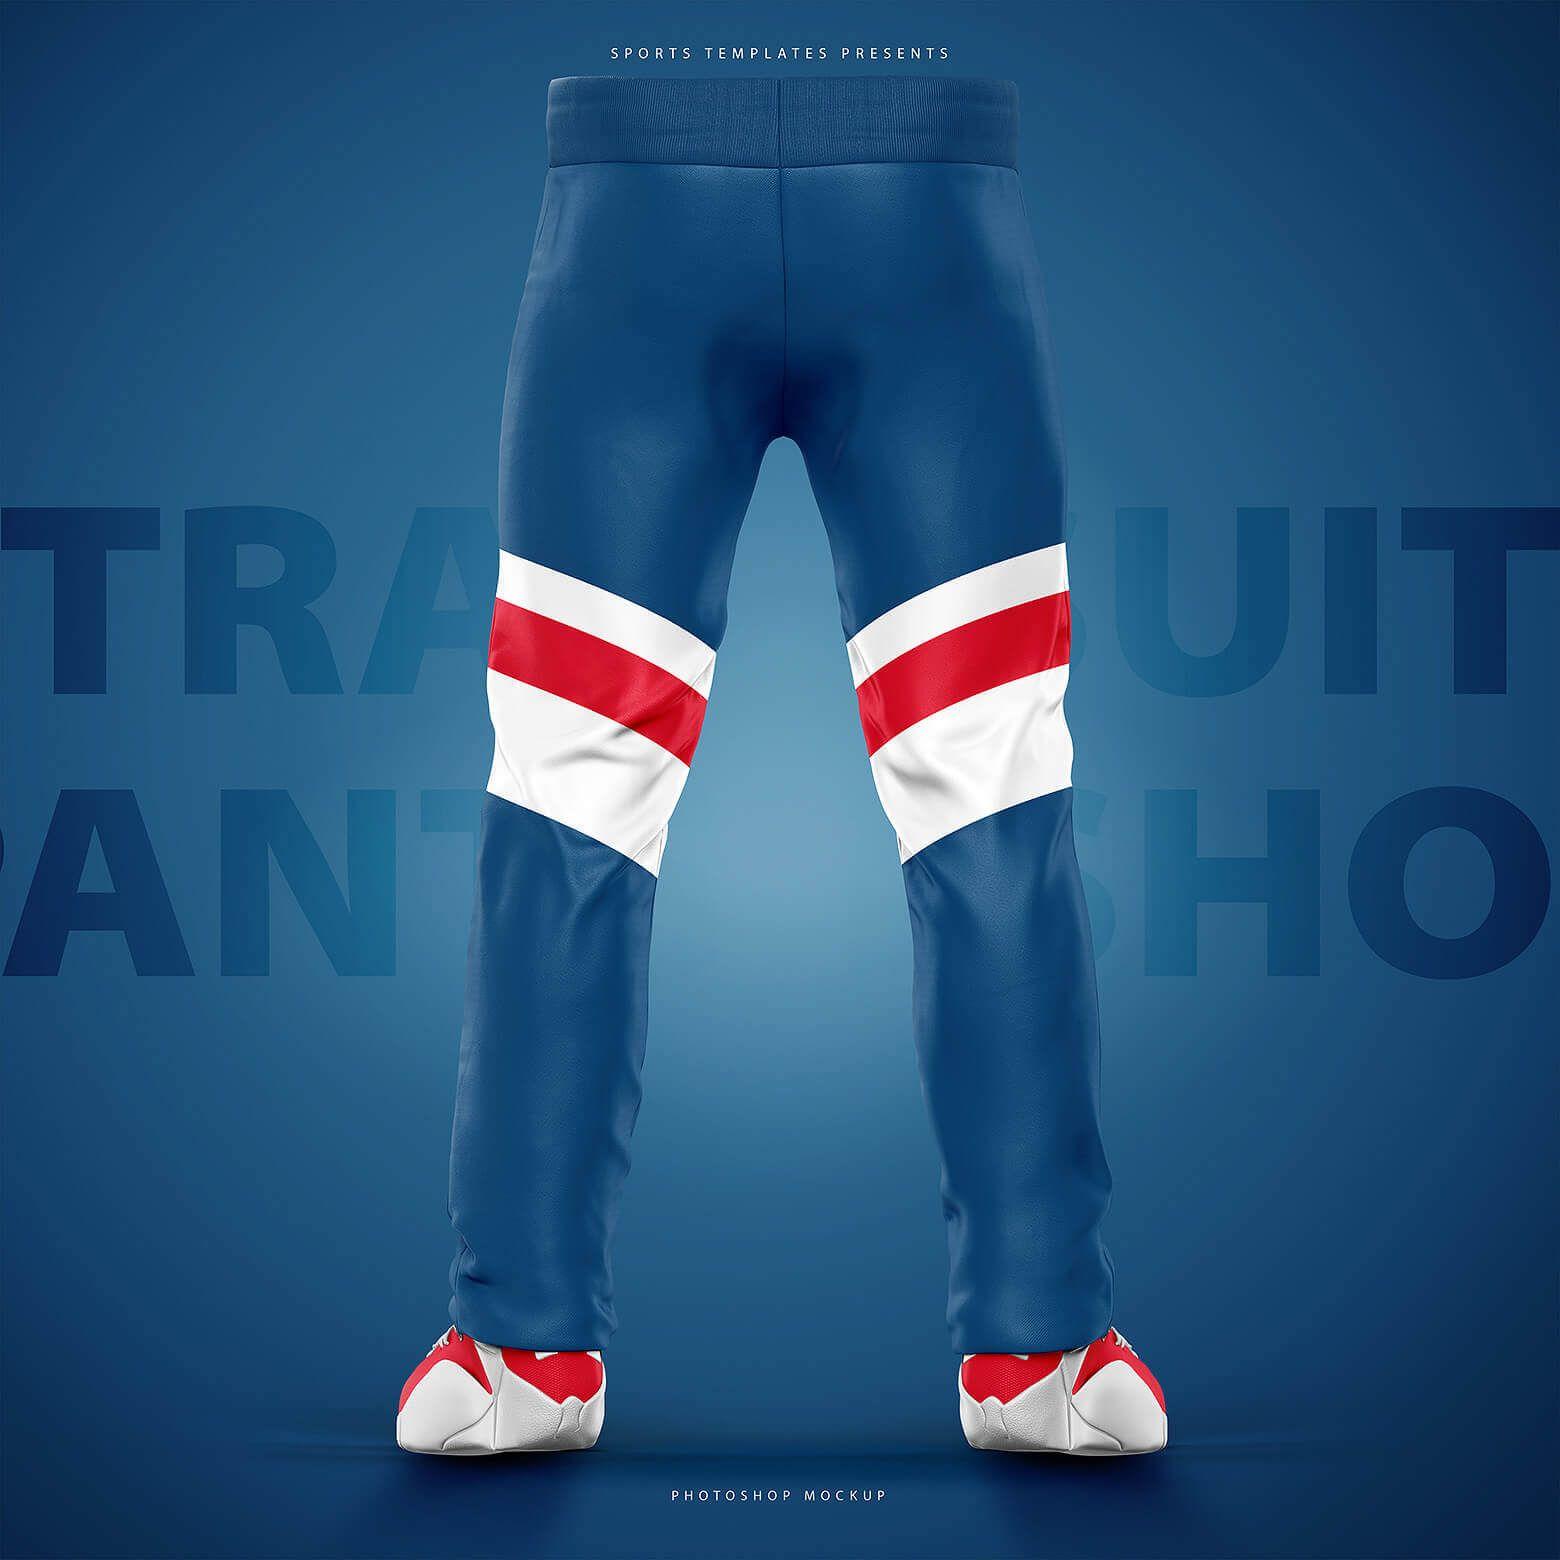 Download Sports Tracksuit Jacket Pants Mockup Sports Templates Tracksuit Jacket Tracksuit Pants